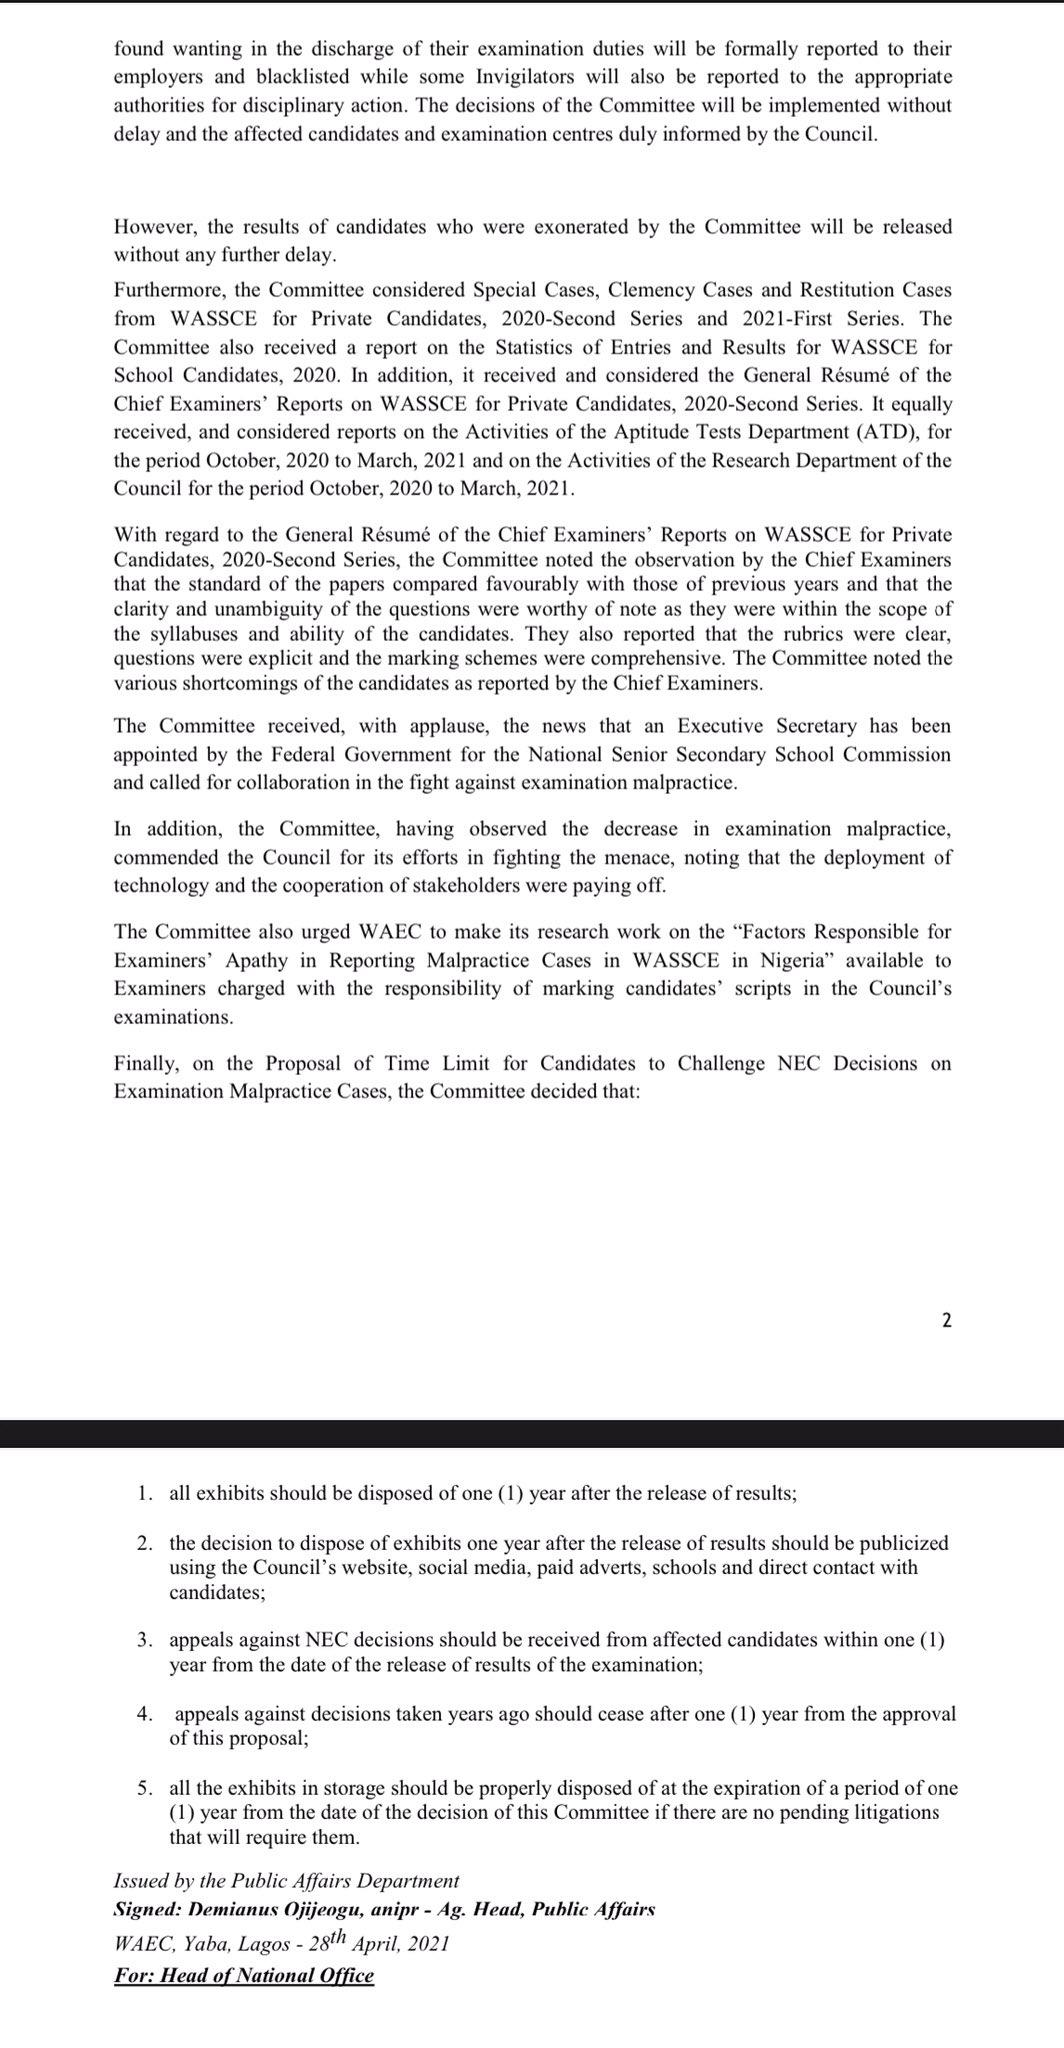 WAEC 71st NEC Meeting Outcome & Press Release 2021